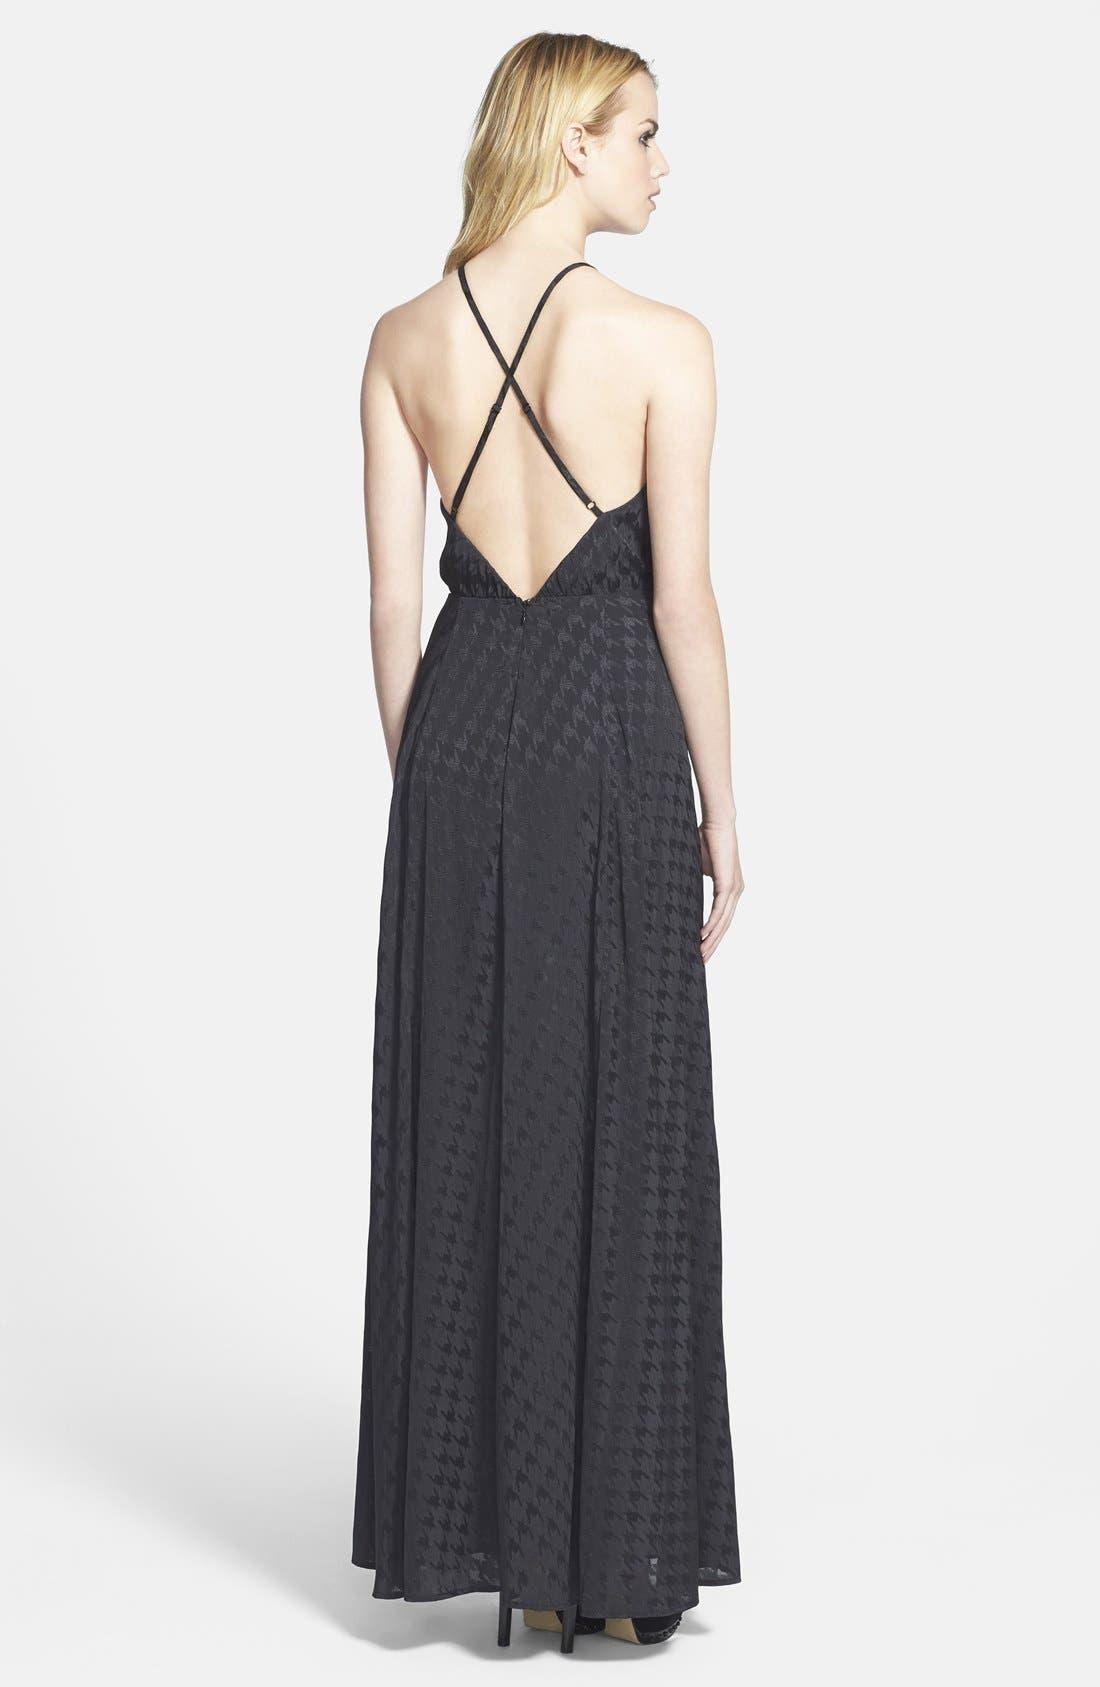 ASTR Jacquard Houndstooth Maxi Dress,                             Alternate thumbnail 3, color,                             001